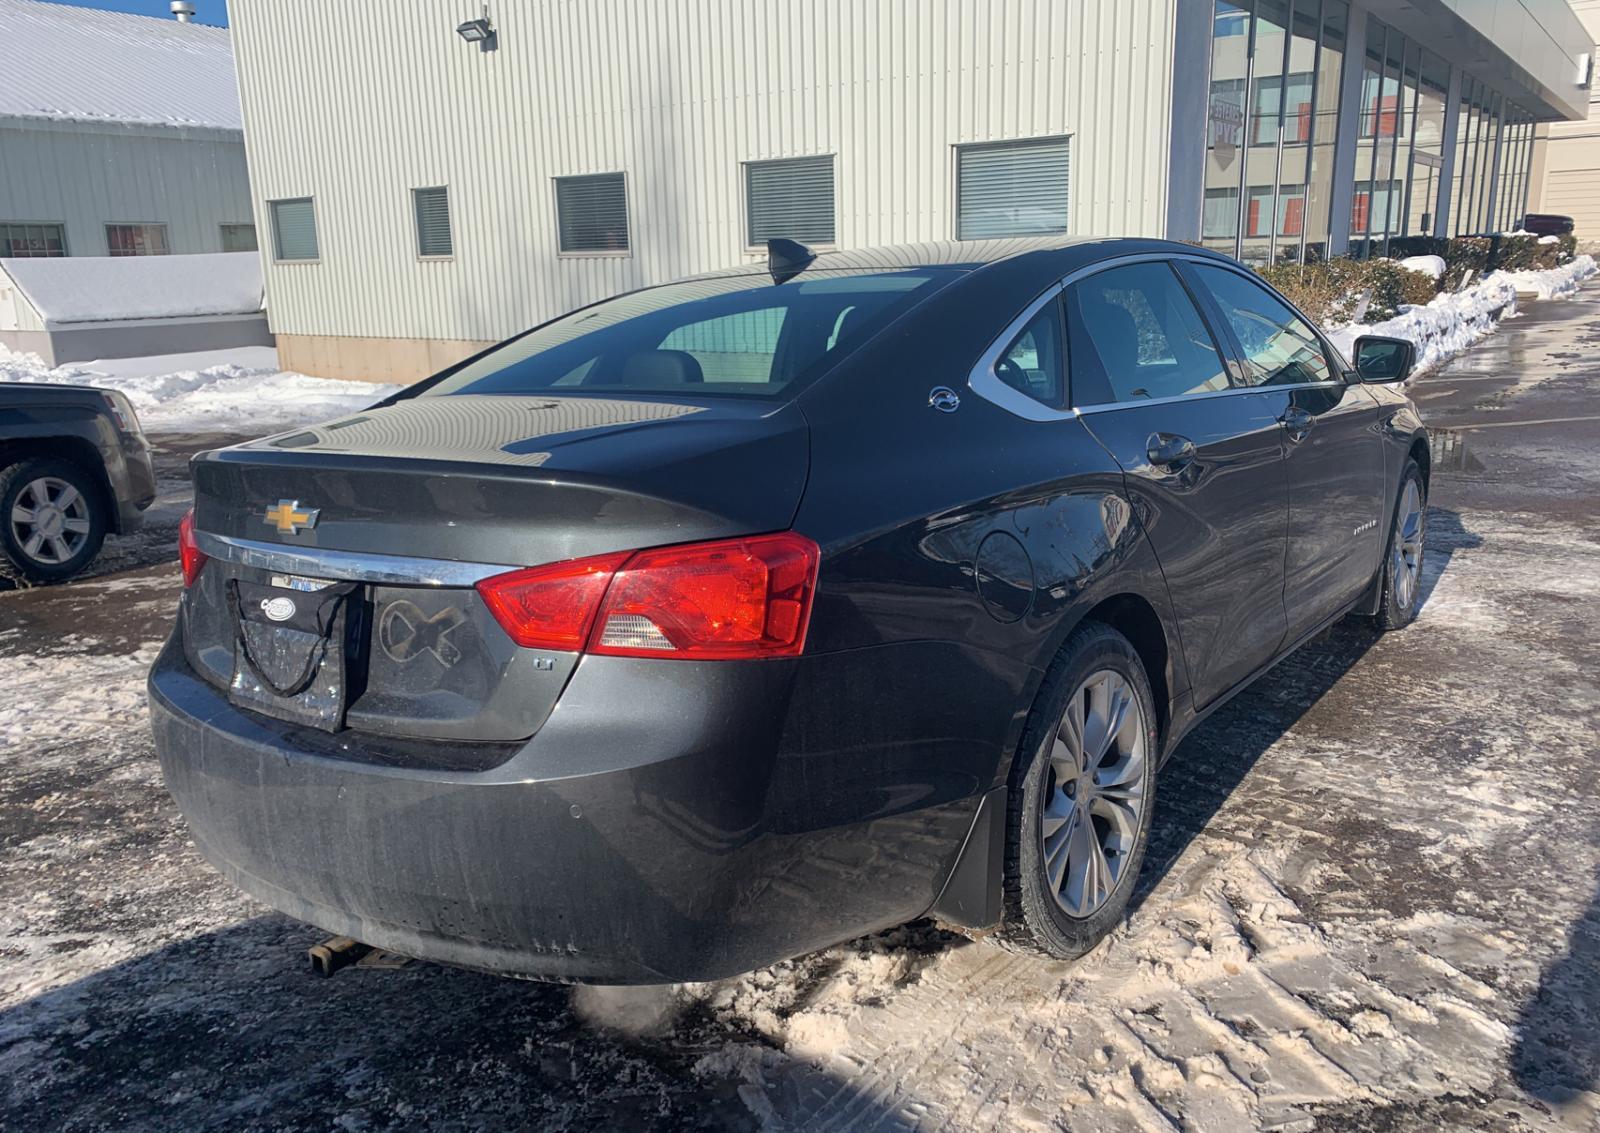 2G1125S37F9185464 - 2015 Chevrolet Impala Lt 3.6L rear view